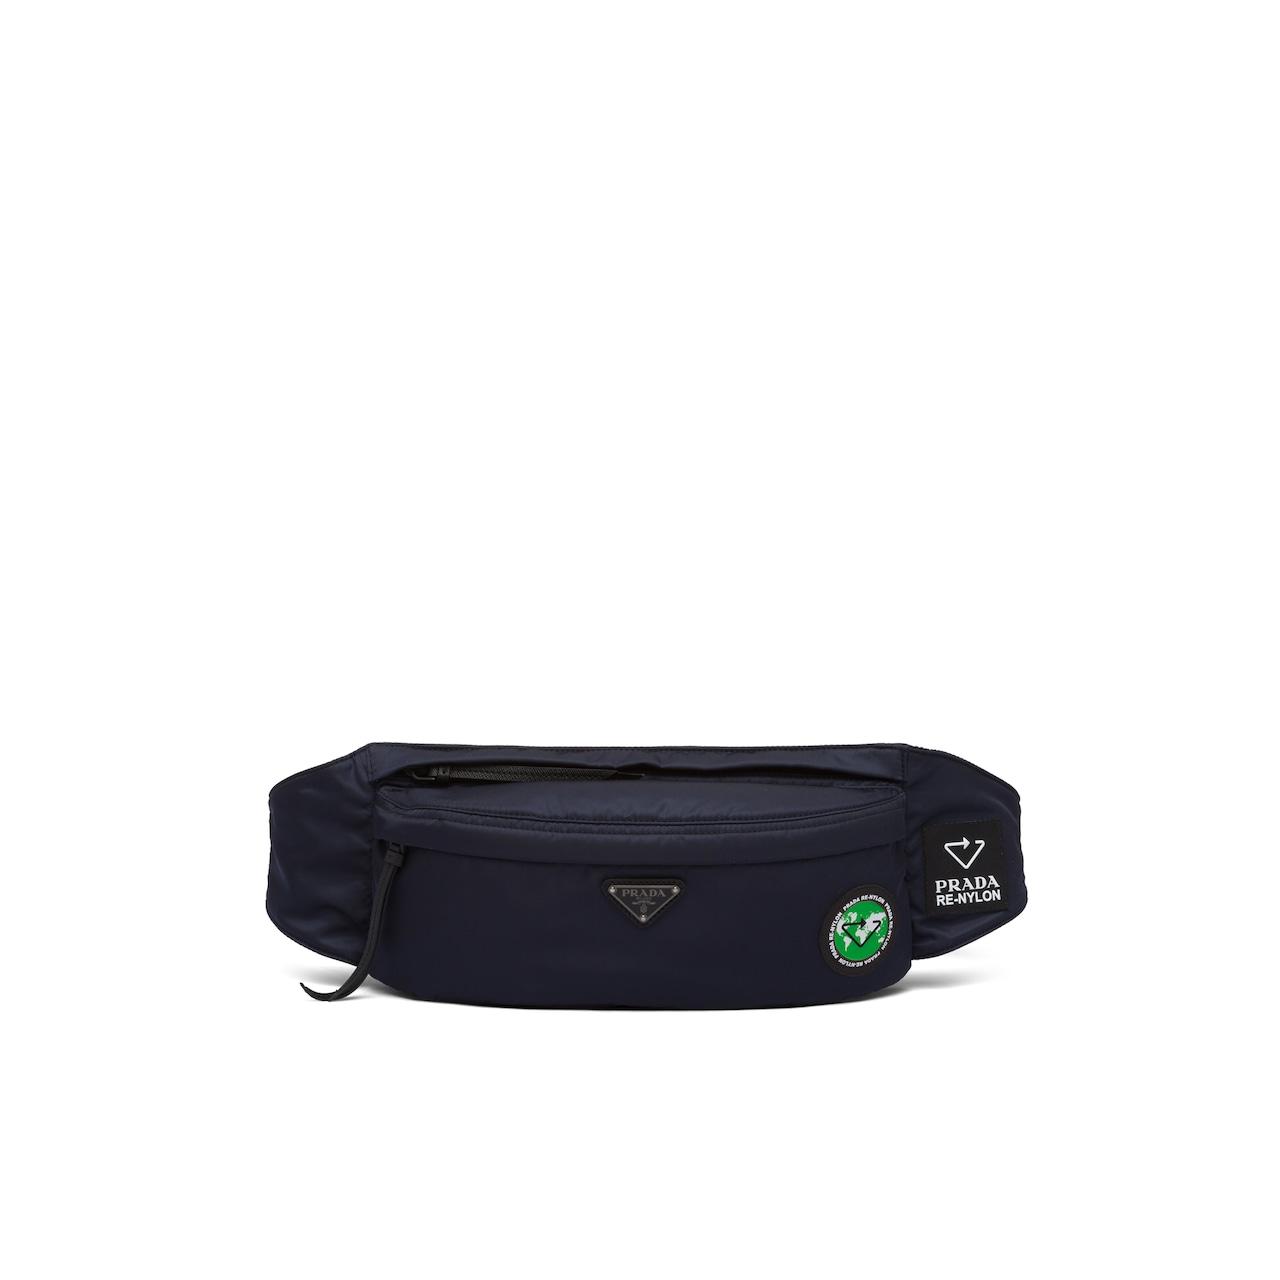 Prada Prada Re-Nylon belt bag 1